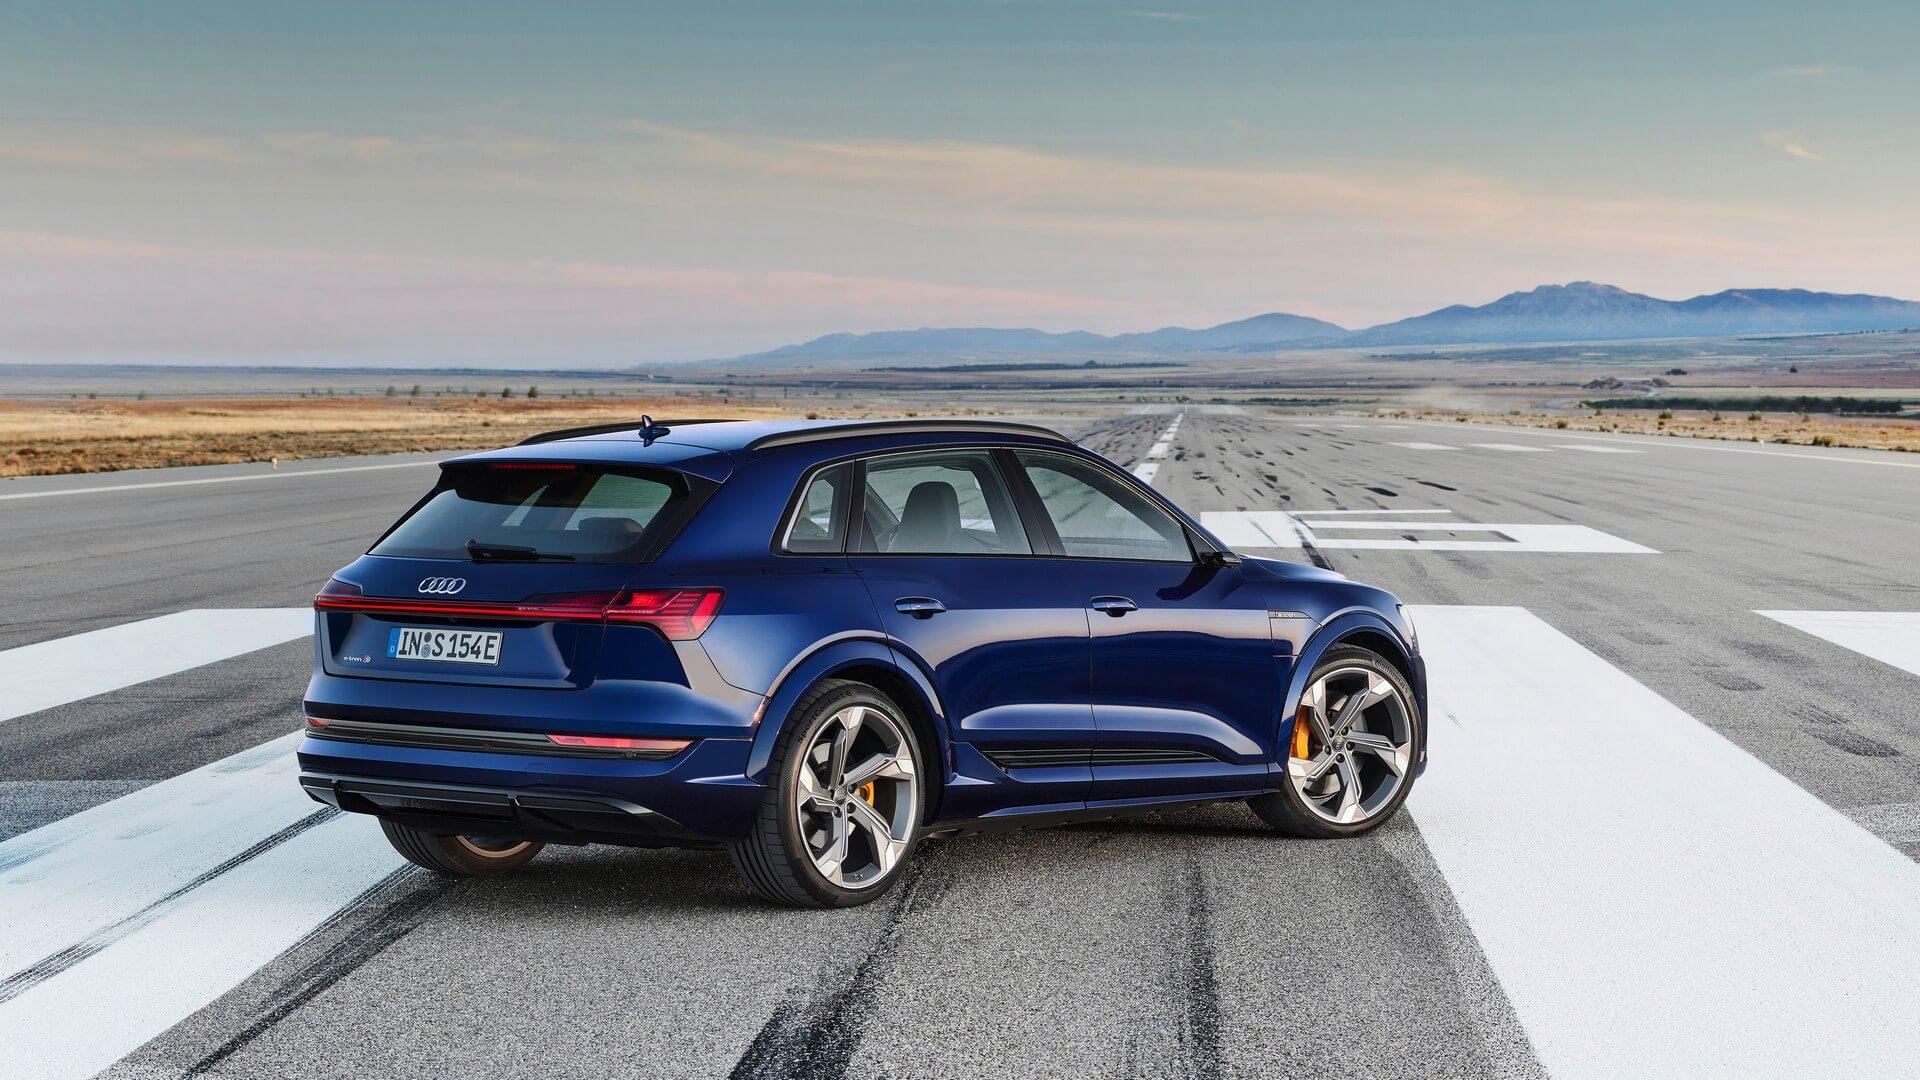 Audi-E-Tron-S-and-E-Tron-S-Sportback-2020-39